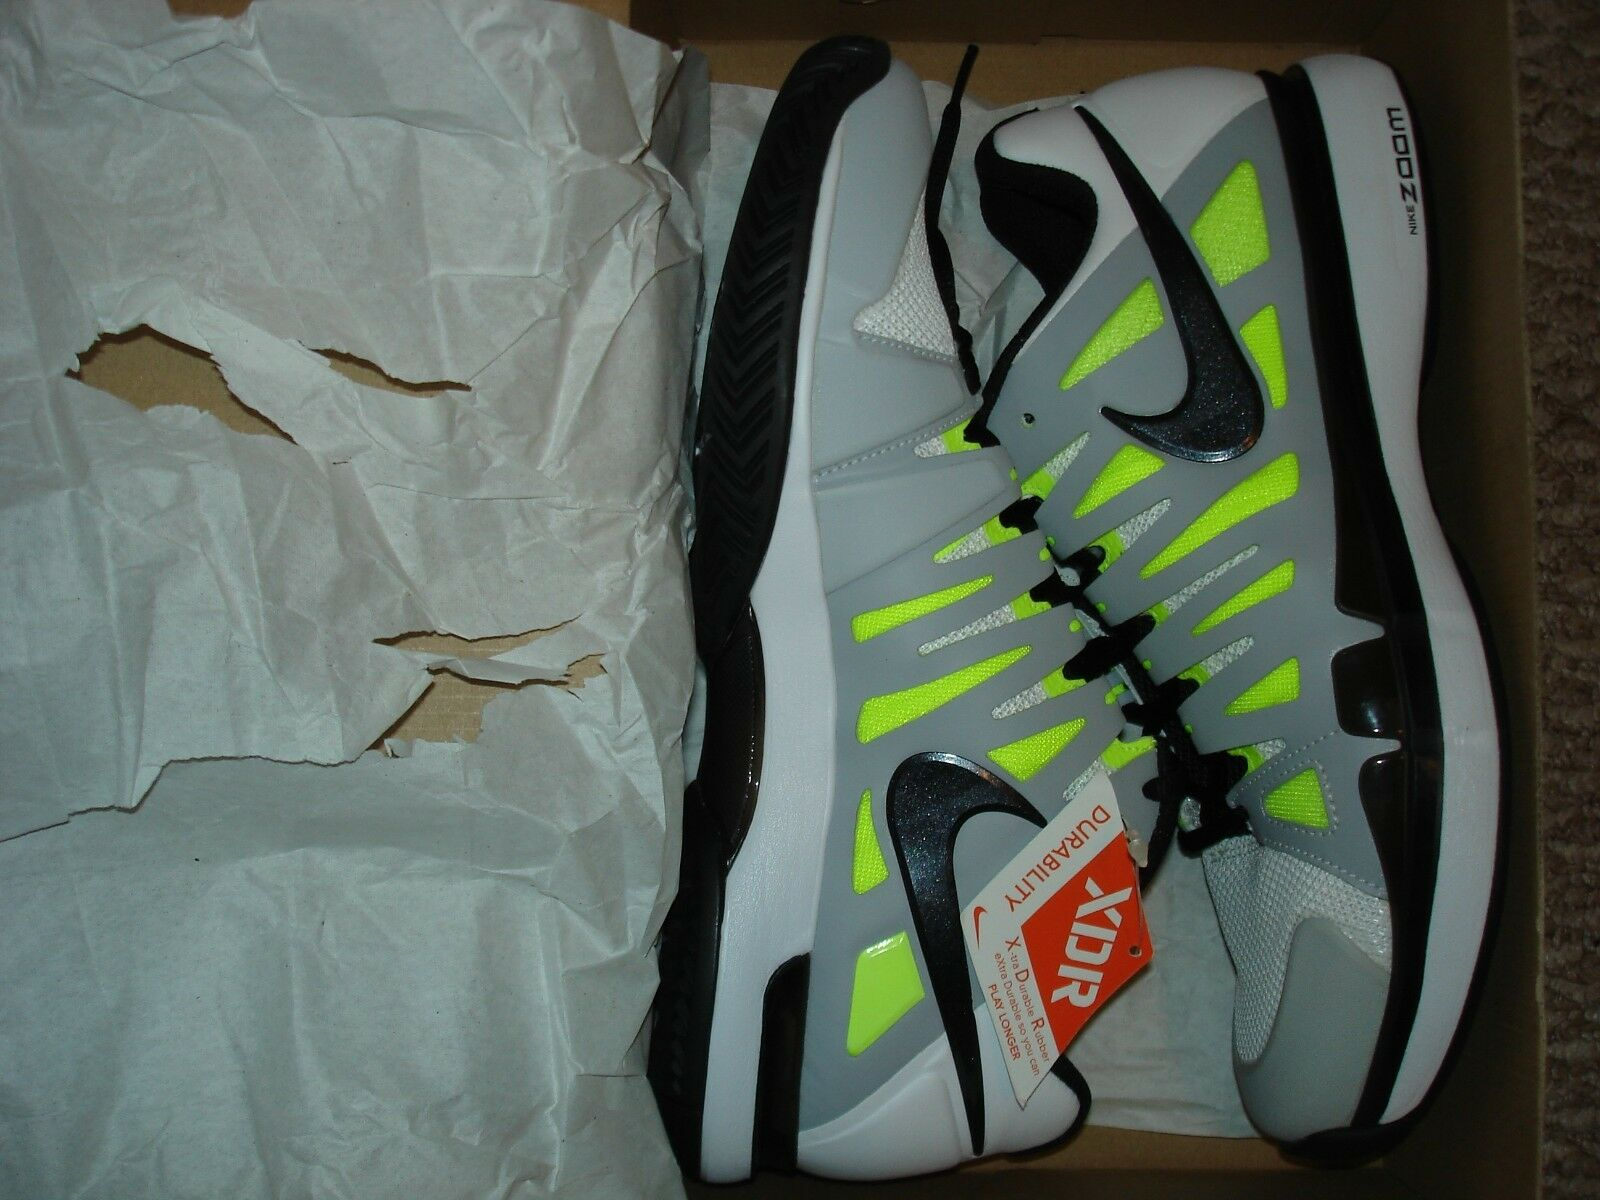 NIB Nike Federer ZOOM VAPOR 9 TOUR White Tennis Shoes 488000-100 Comfortable Cheap and beautiful fashion